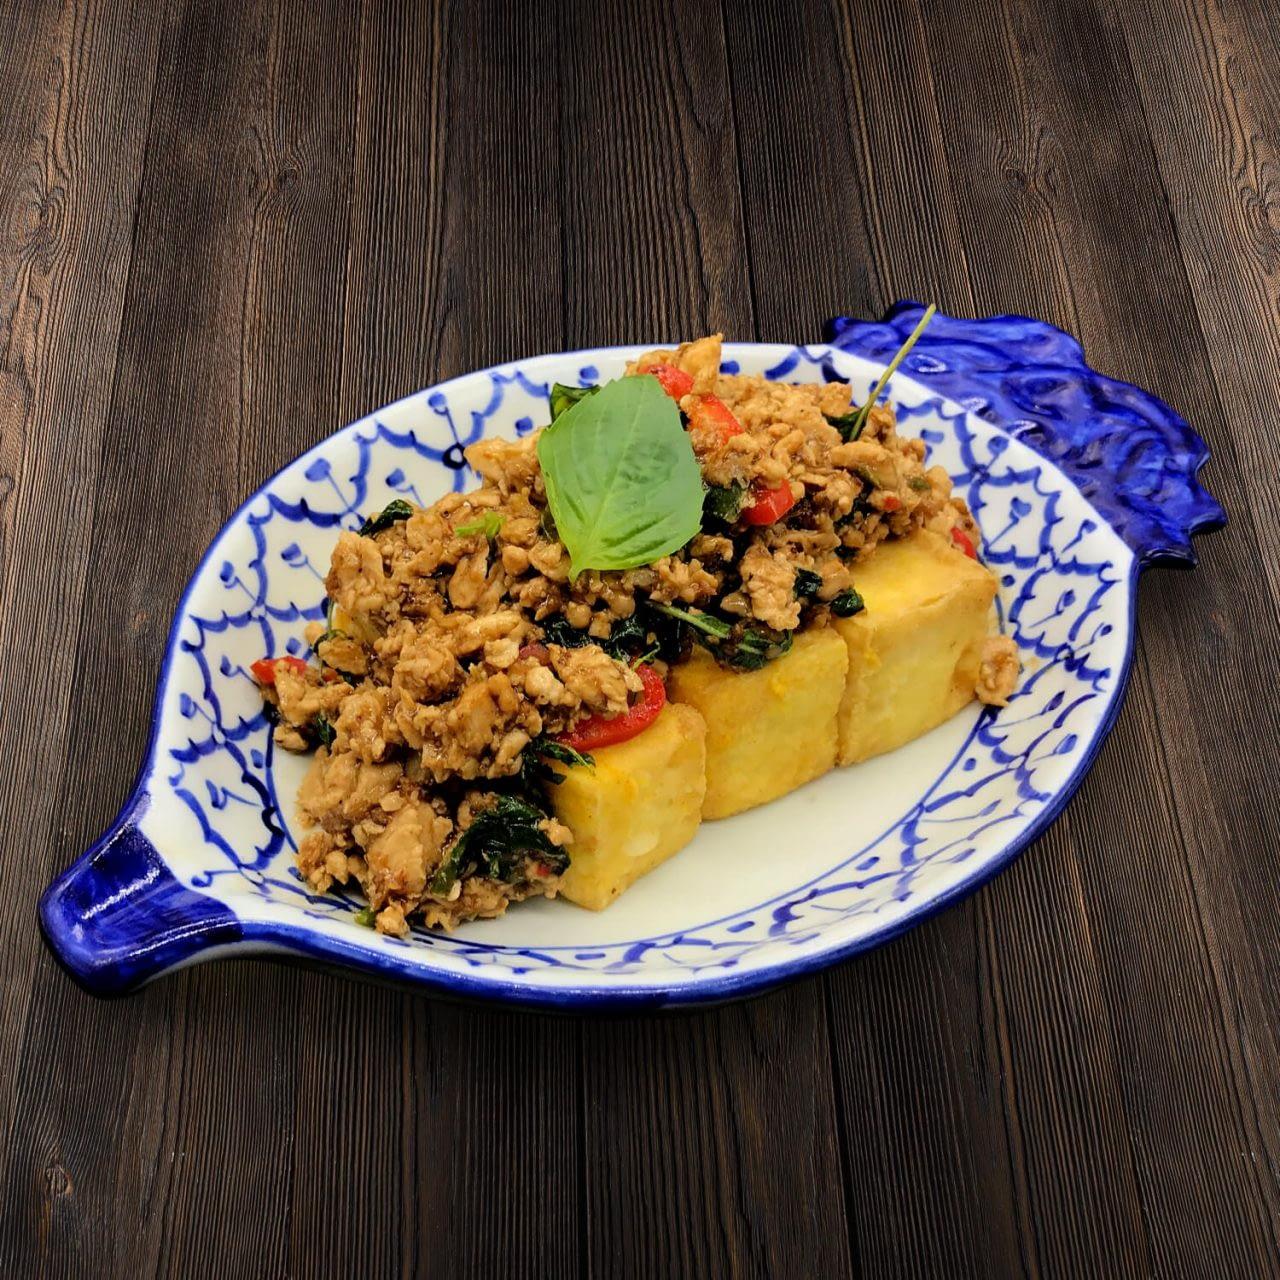 Thai Food Delivery Kuala Lumpur Thai Basil Leaf Minced Chicken Beancurd